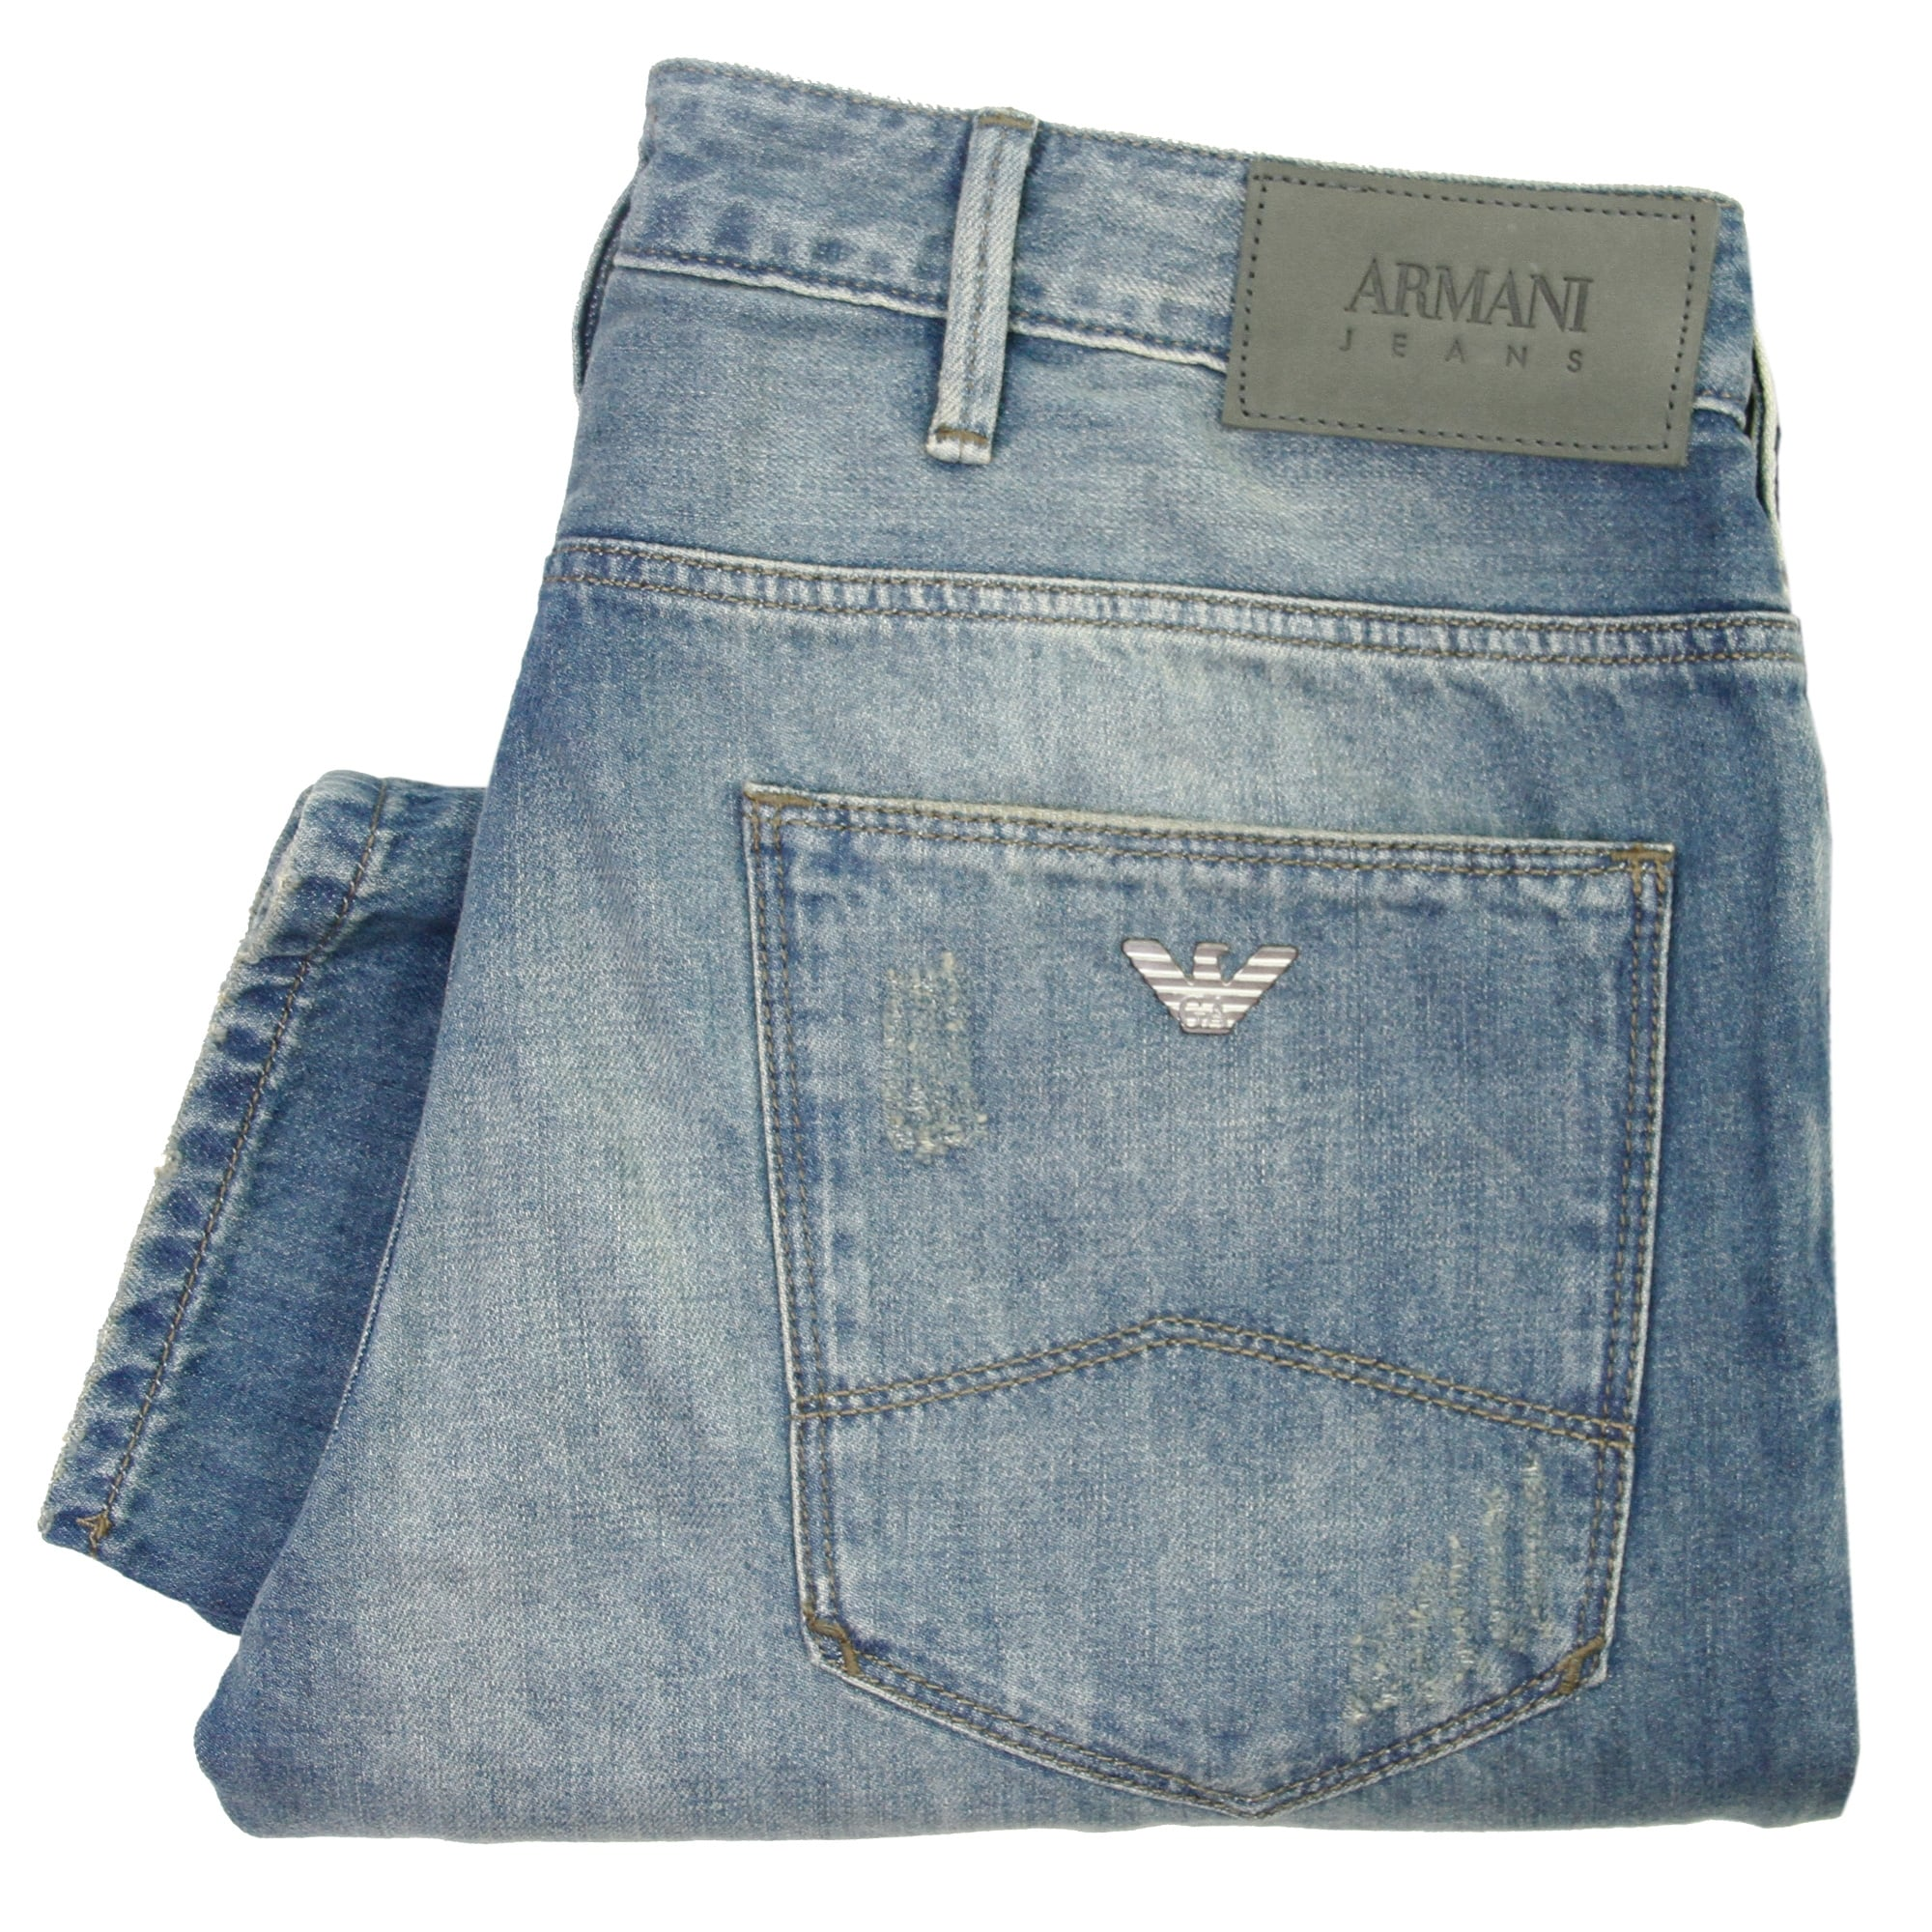 huge selection of d2444 254dd Armani Jeans Armani Jeans J06 Denim Jeans 6DACZ